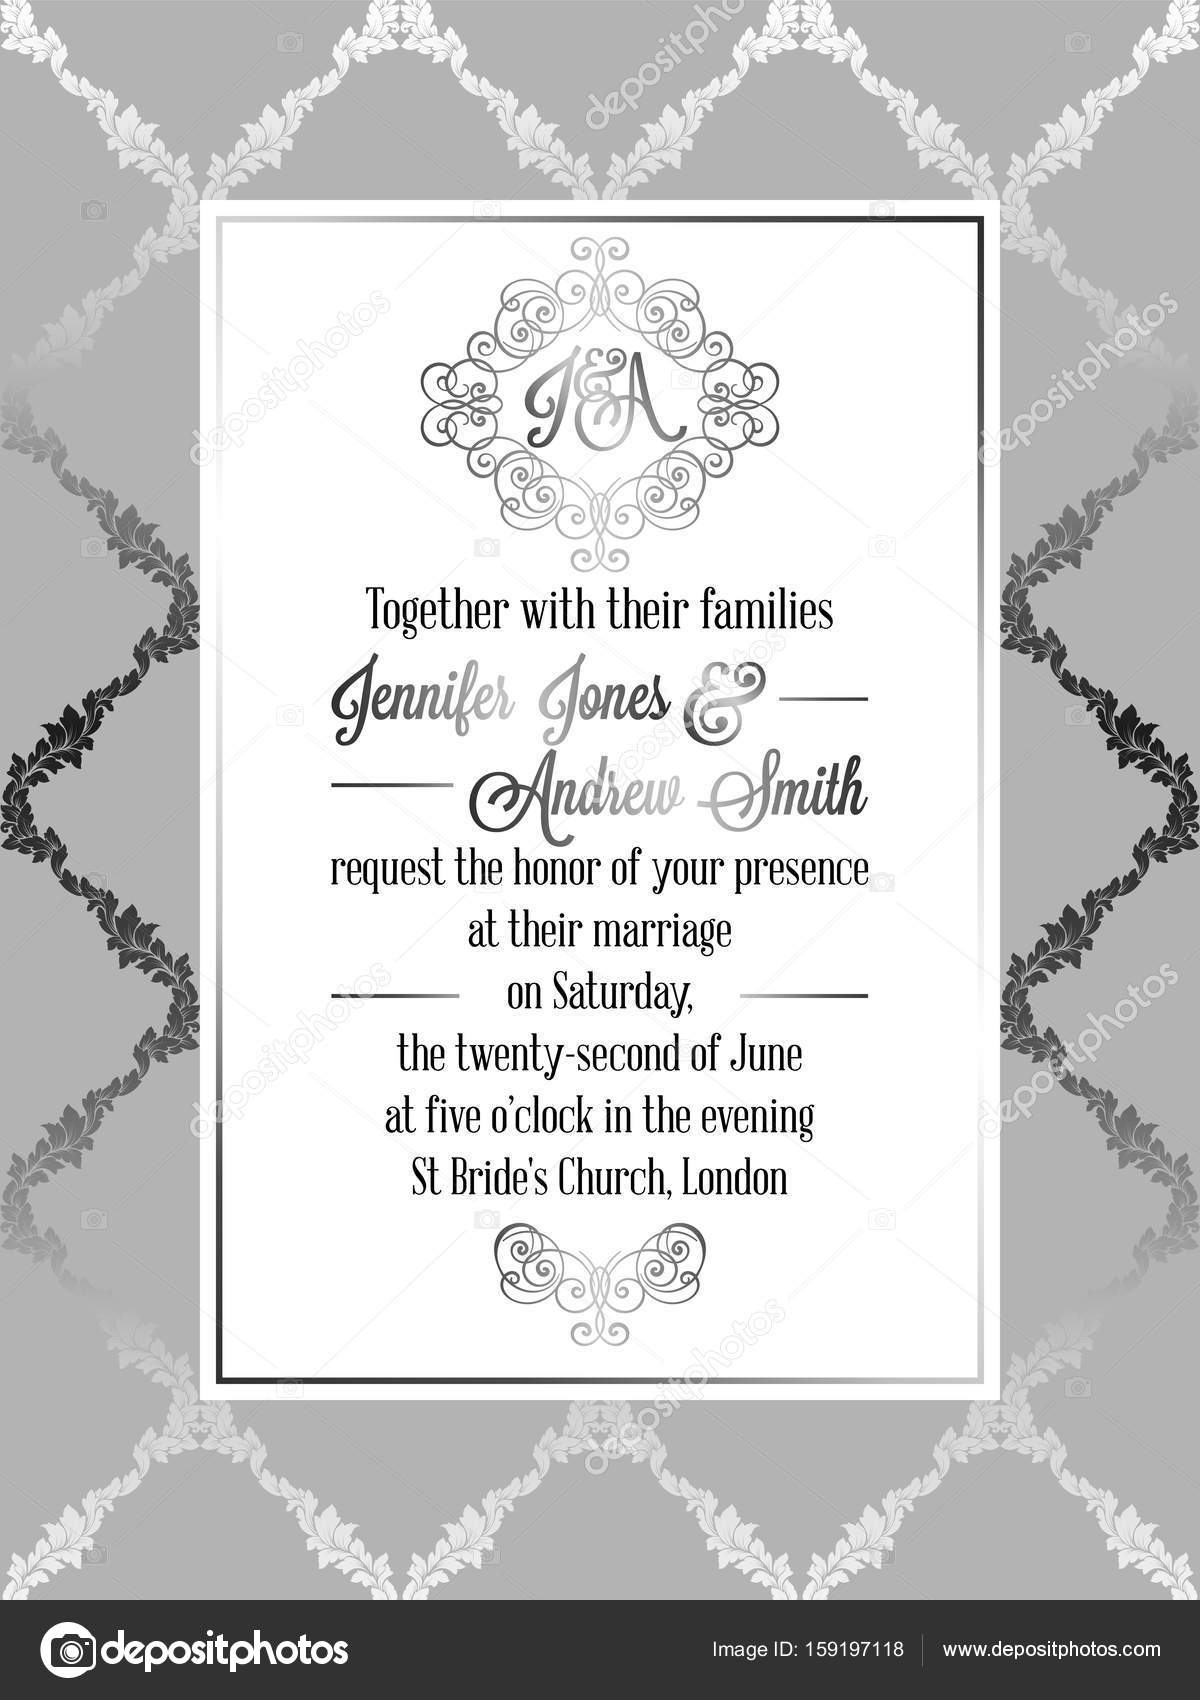 Invitacion Evento Formal Plantilla De Tarjeta De